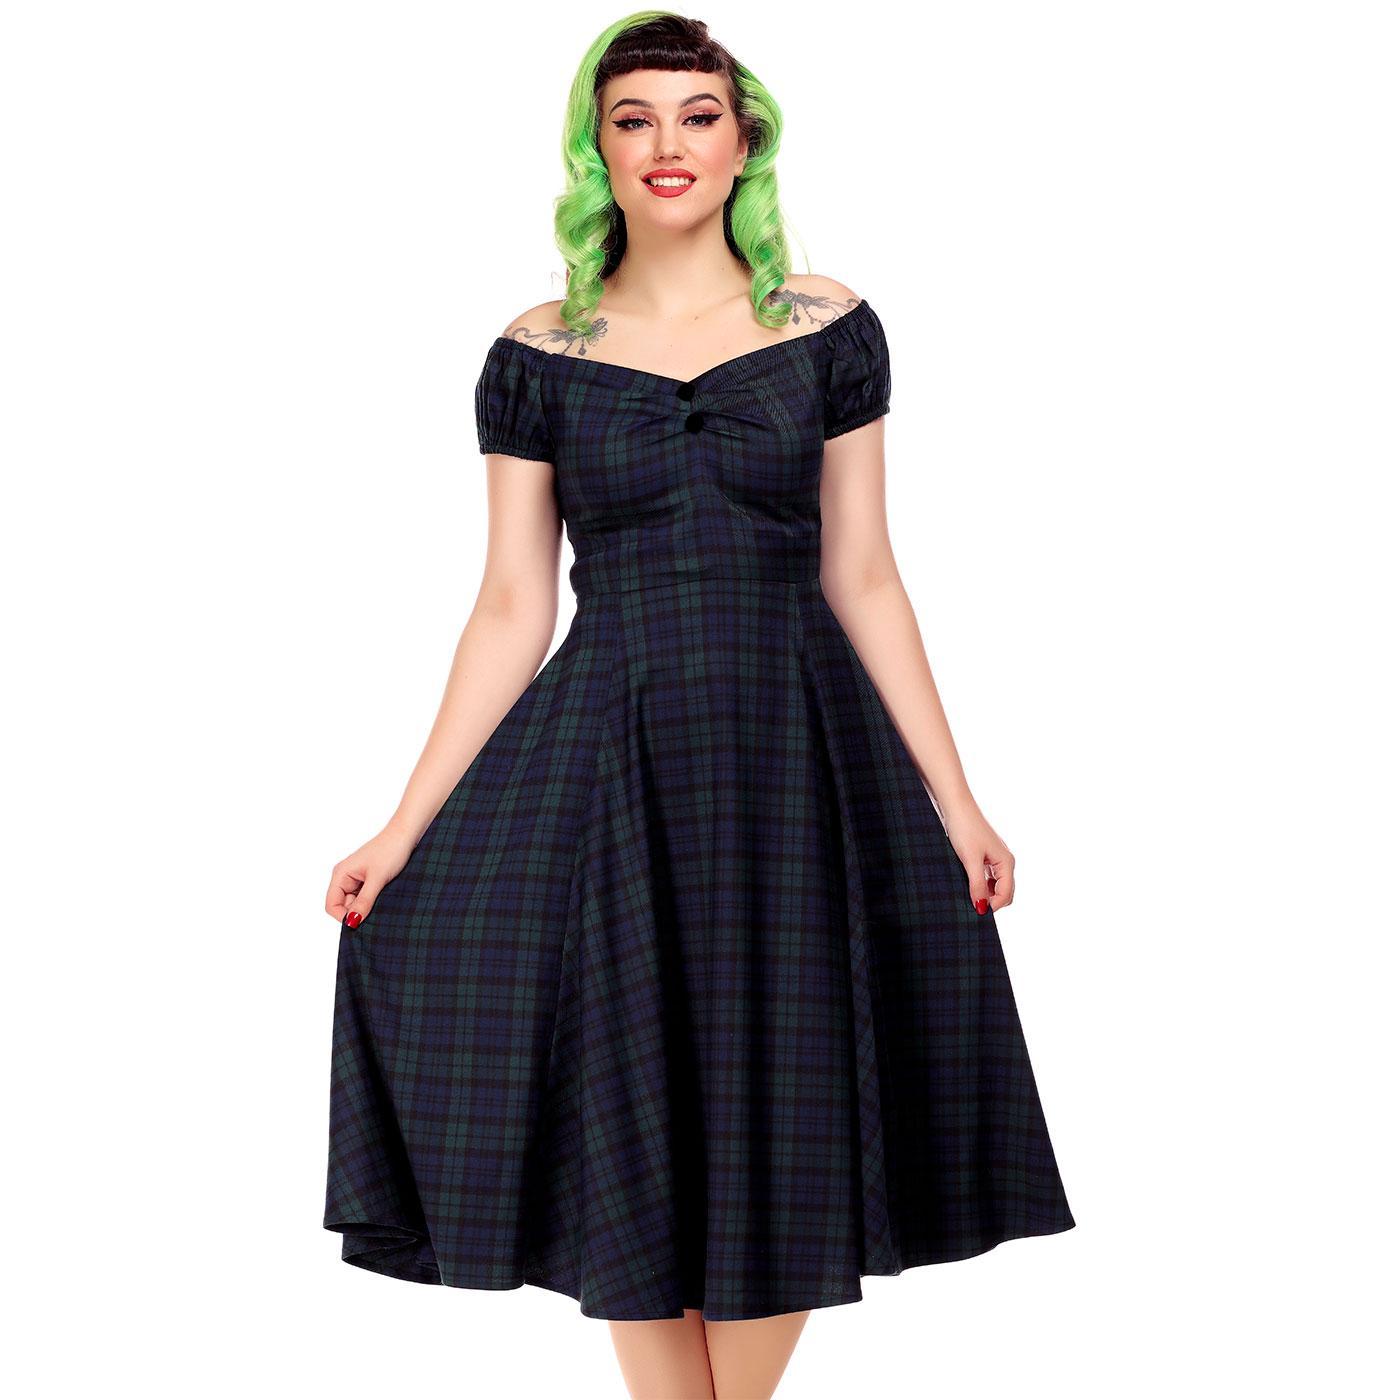 Dolores COLLECTIF Blackwatch Tartan Doll Dress